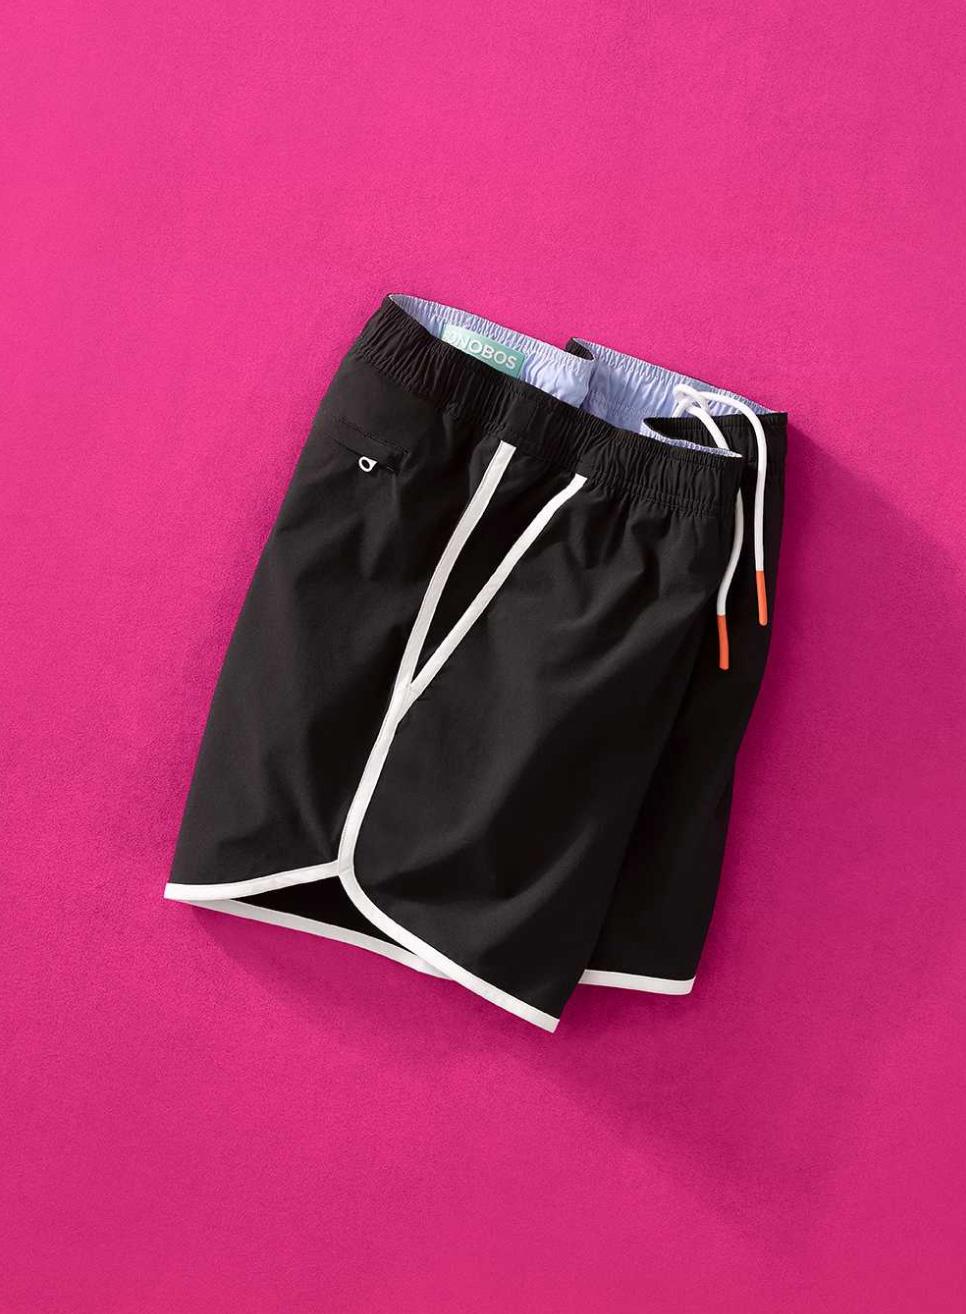 image of a black throwback swim trunk